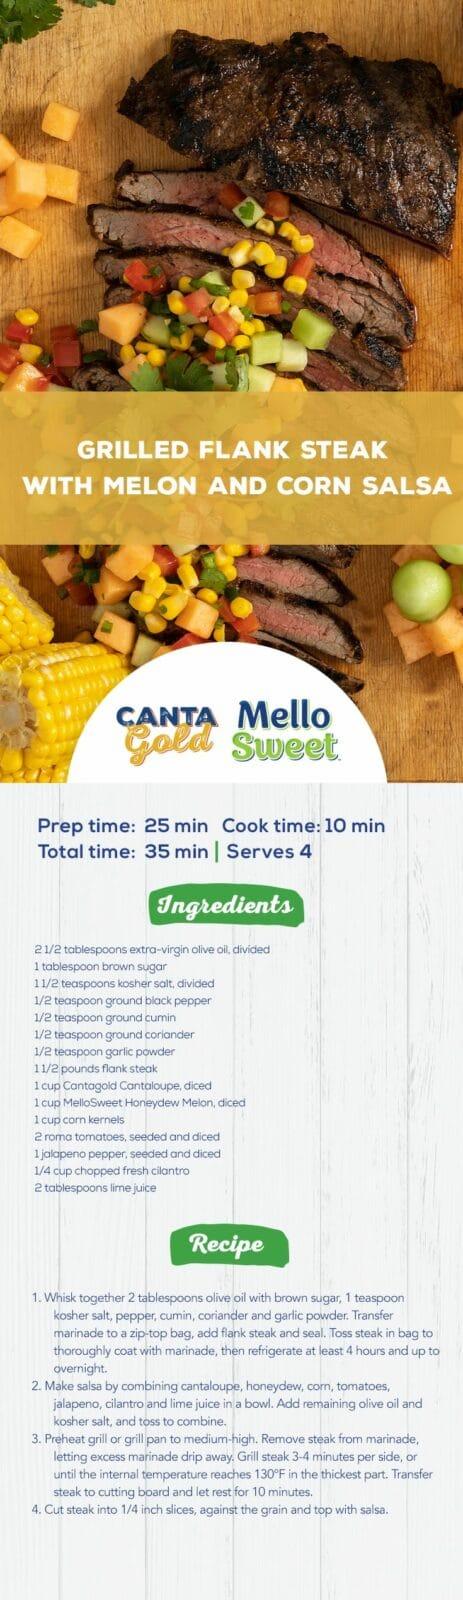 CantaGoldMellow_PinterestPinPinterest_Grilled Flank Steak with Melon and Corn Salsa